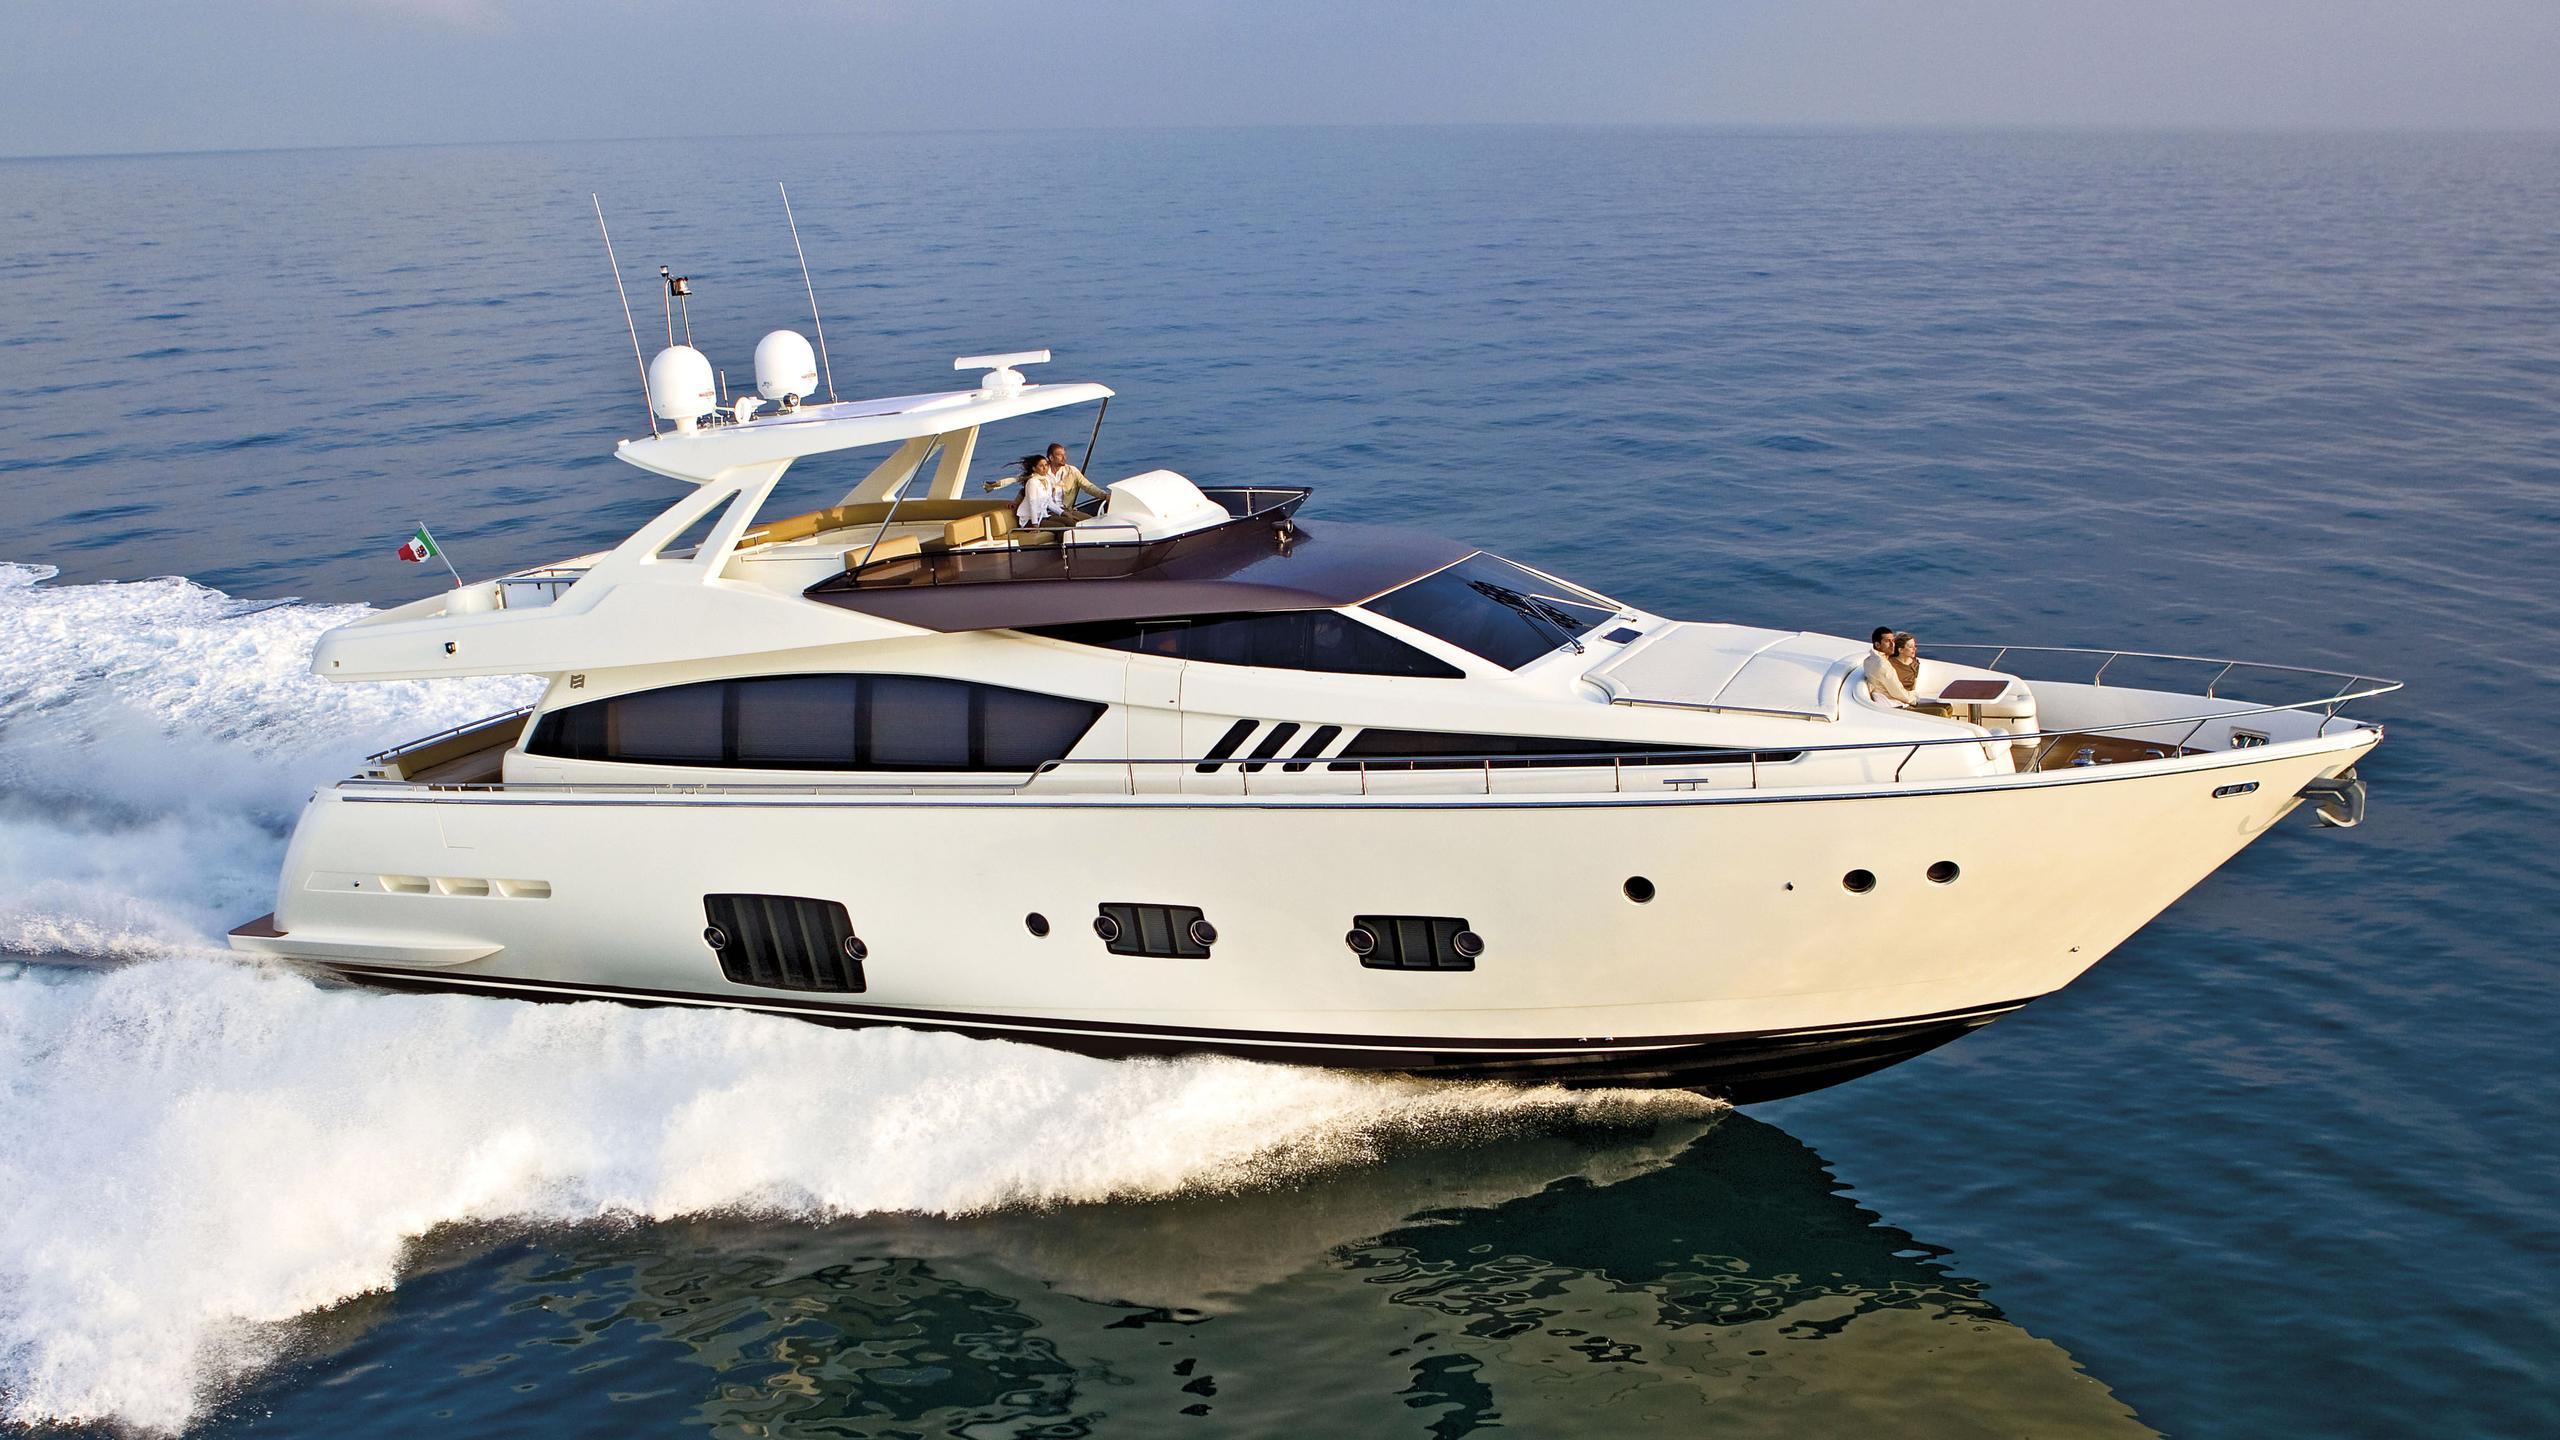 ferretti-800-10-motor-yacht-ferretti-2014-25m-cruising